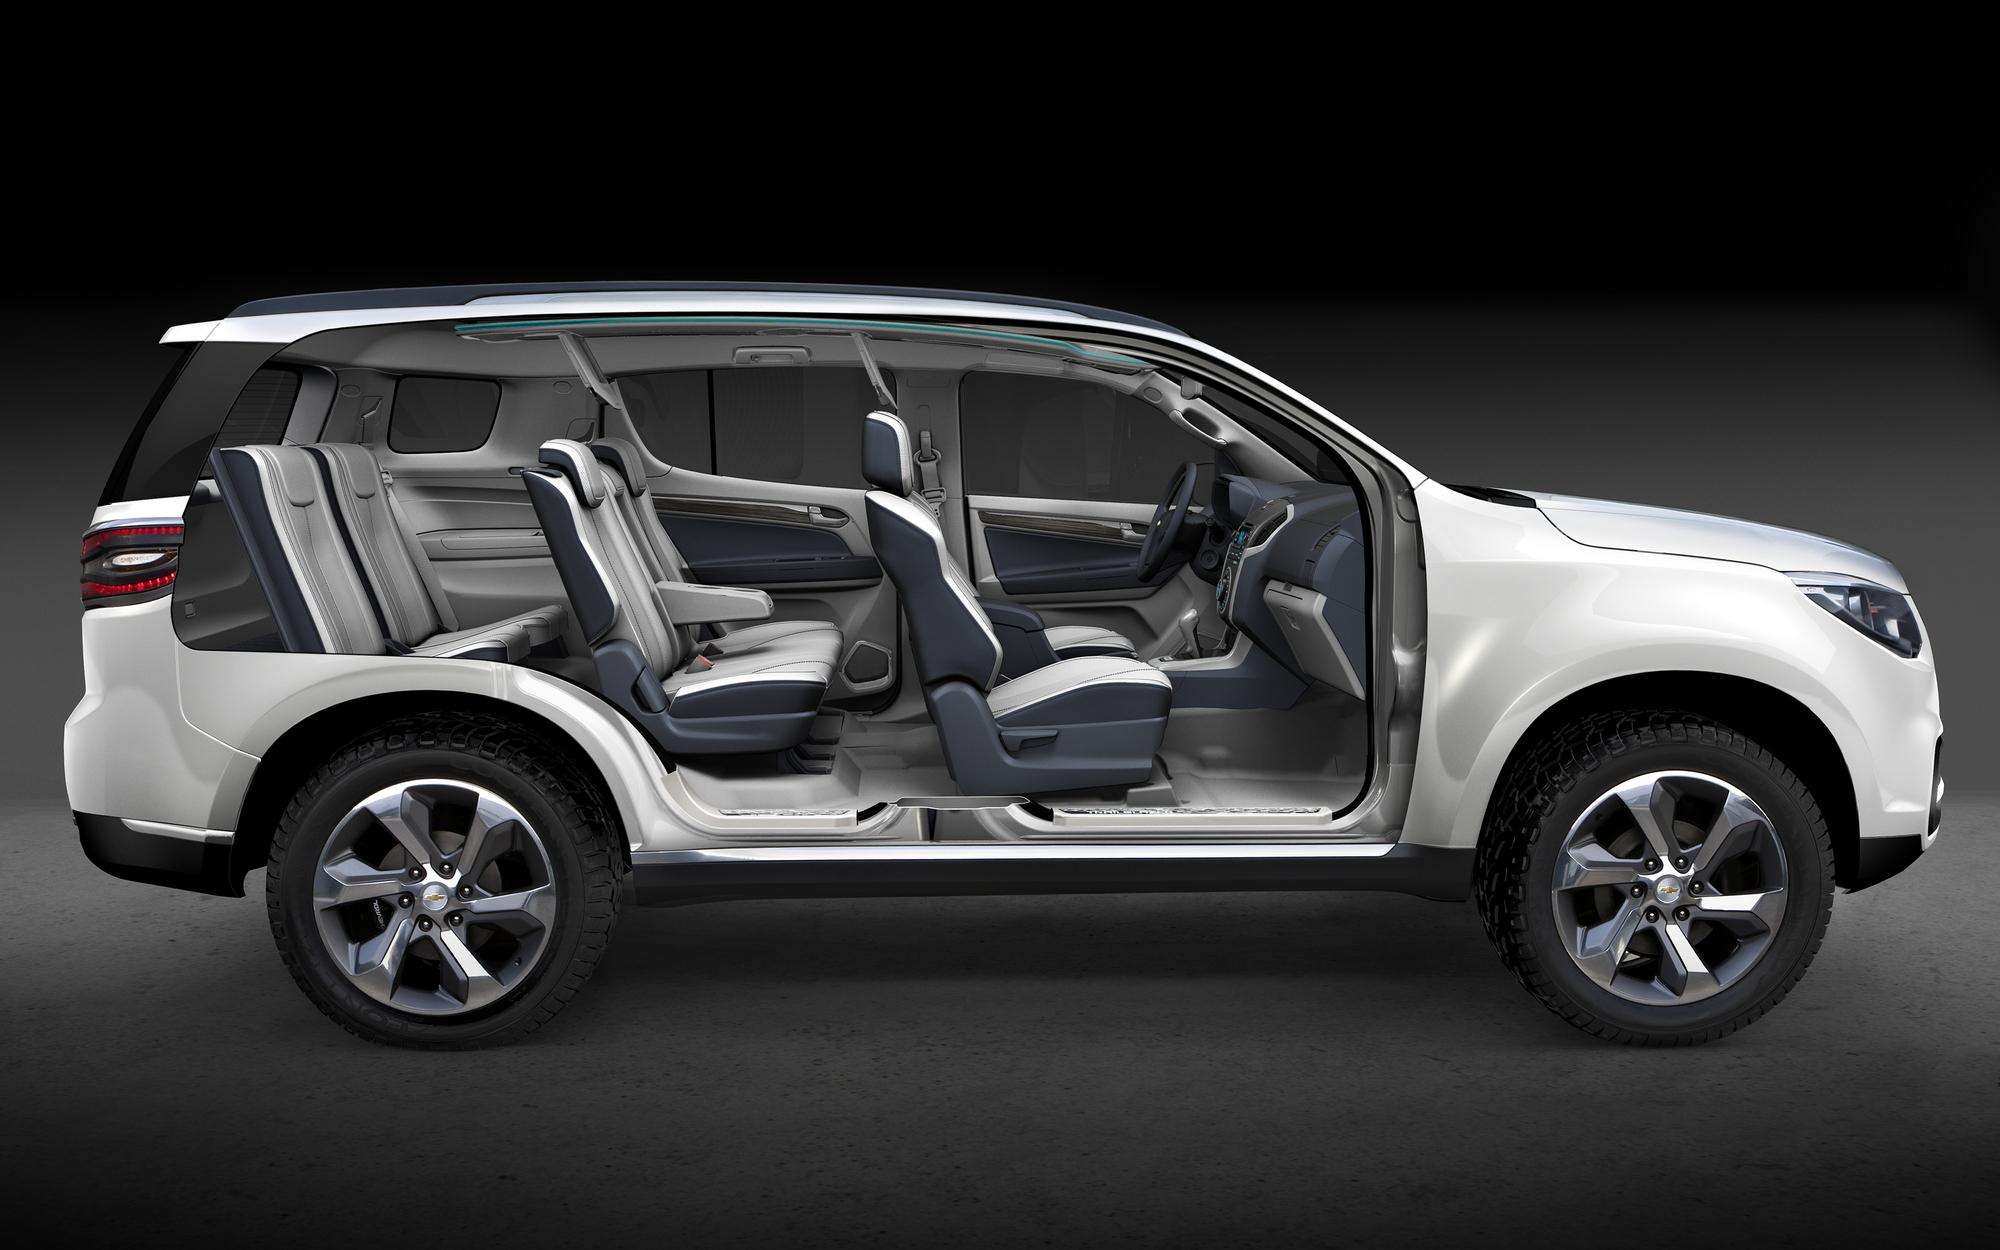 2012 Used Chevy Traverse interior